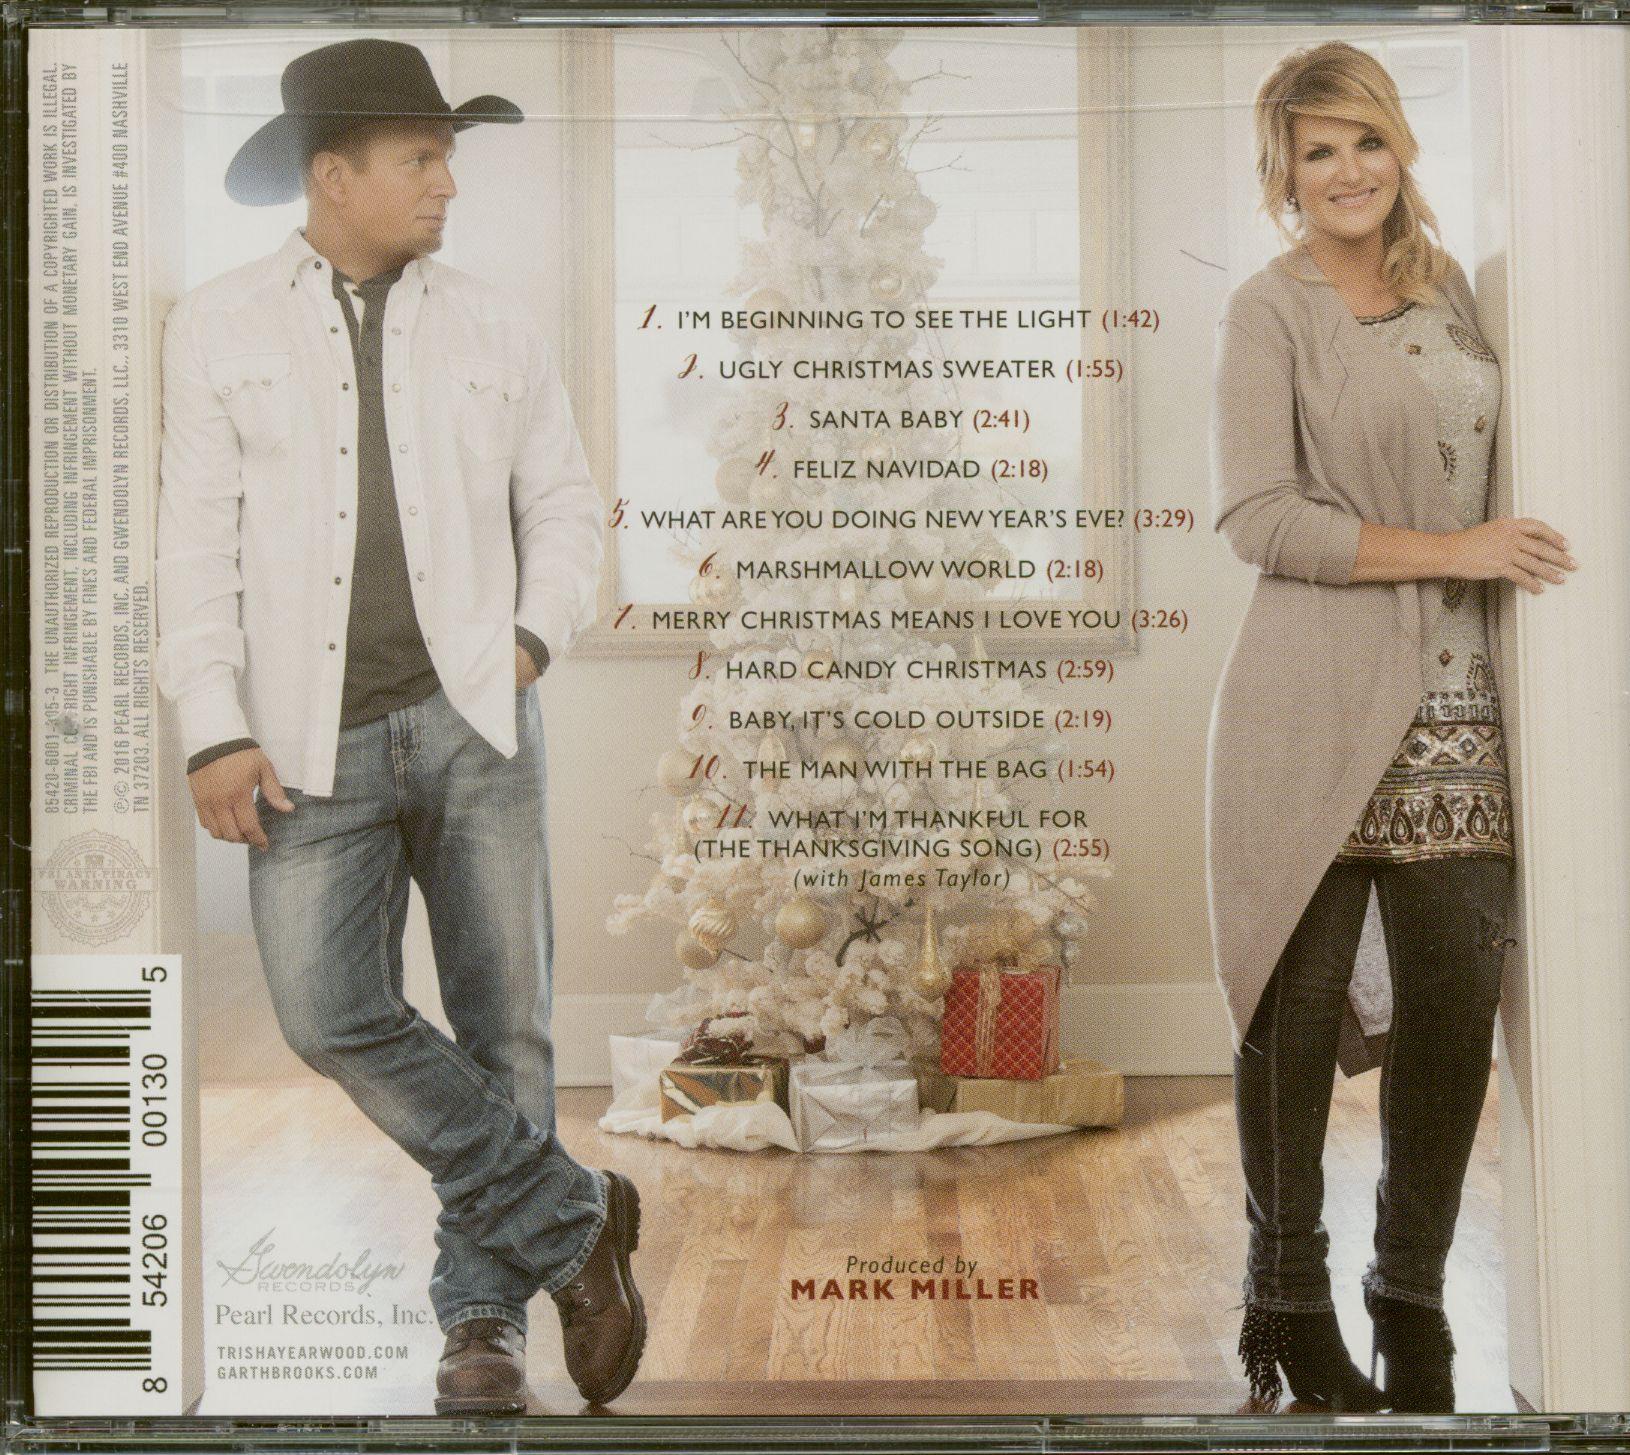 Garth Brooks CD: Christmas Together - Garth Brooks & Trisha Yearwood (CD) - Bear Family Records